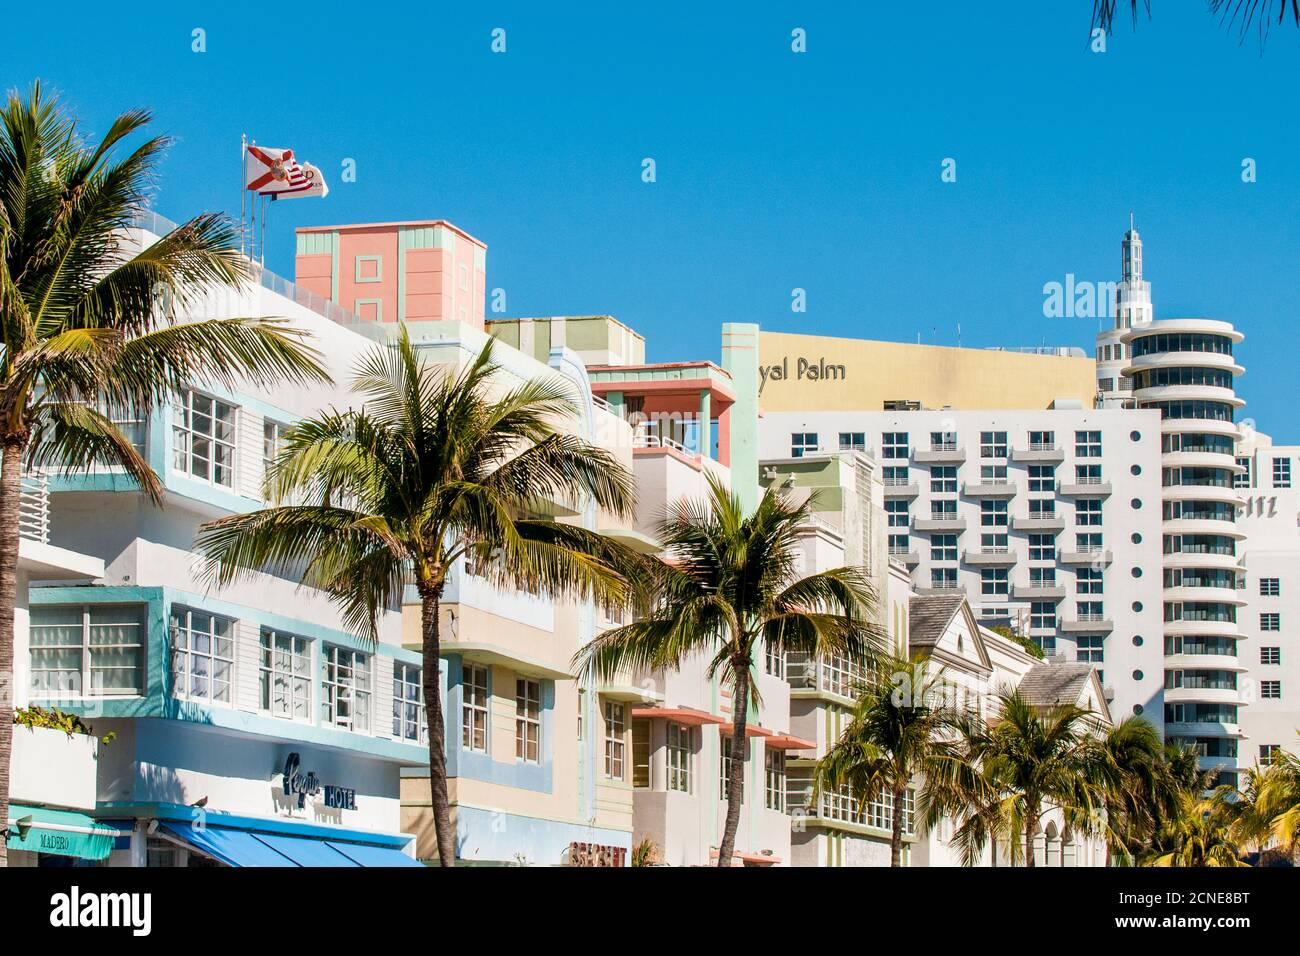 Art Deco architecture in South Beach district, Miami, Florida, United States of America Stock Photo